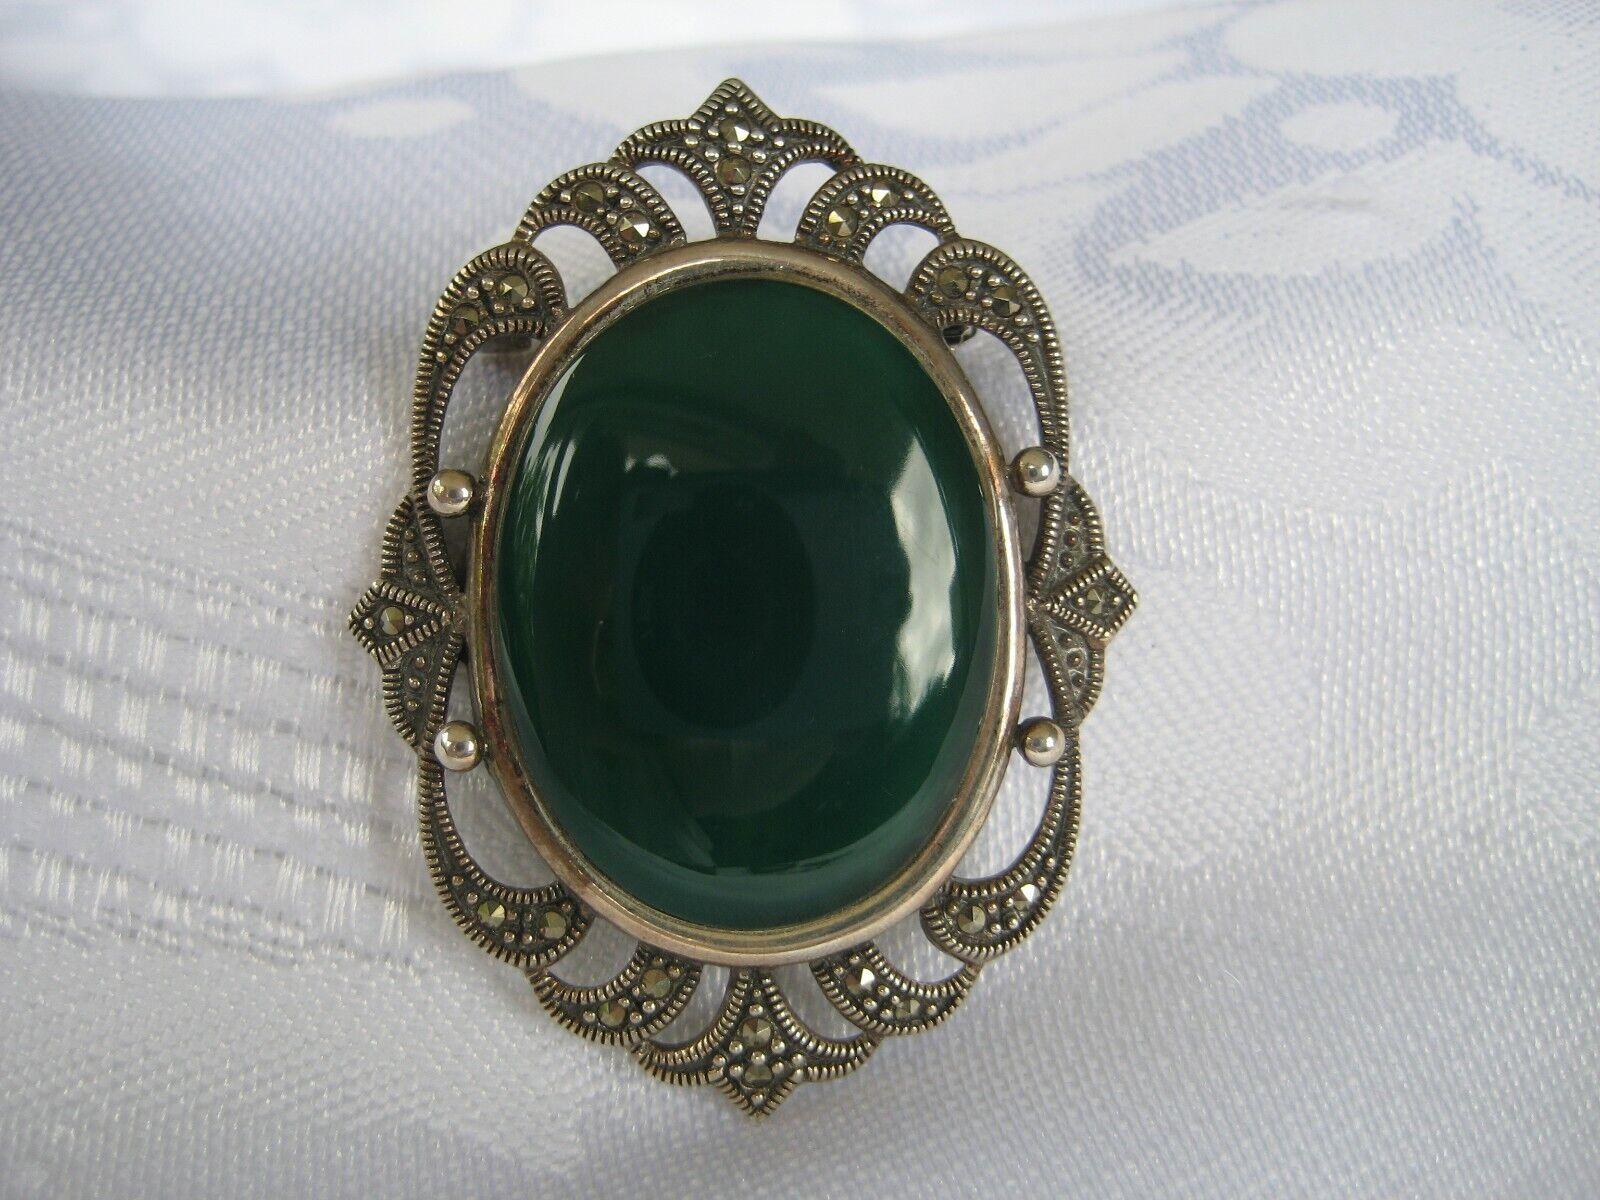 Großer Art Deco Anhänger Brosche 925 Silber Achat grün Markasiten Unikat